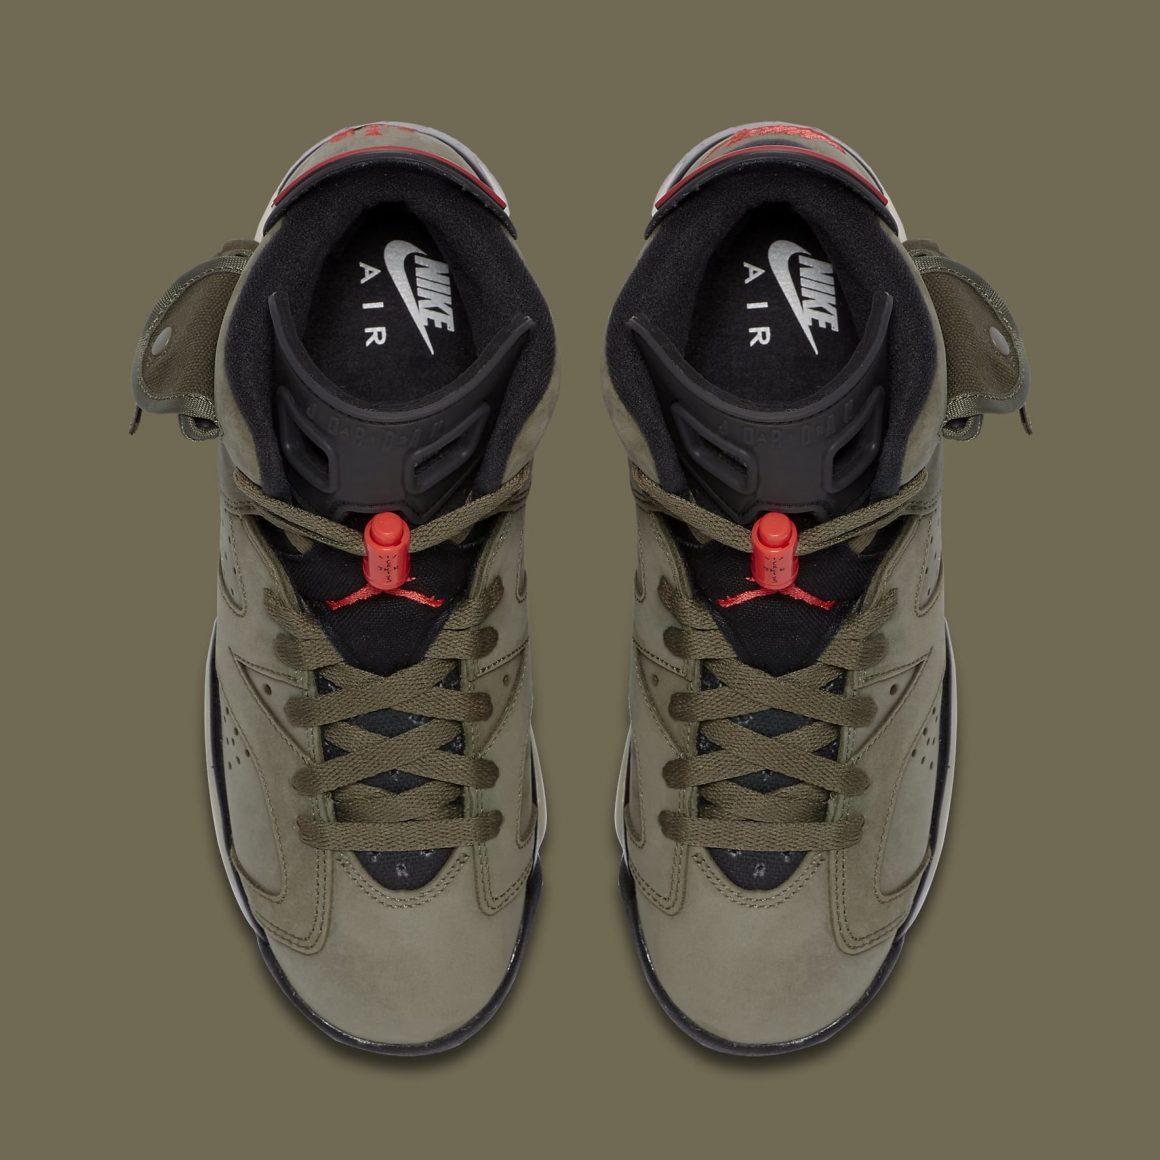 Travis Scott x Air Jordan 6 ''Cactus Jack''